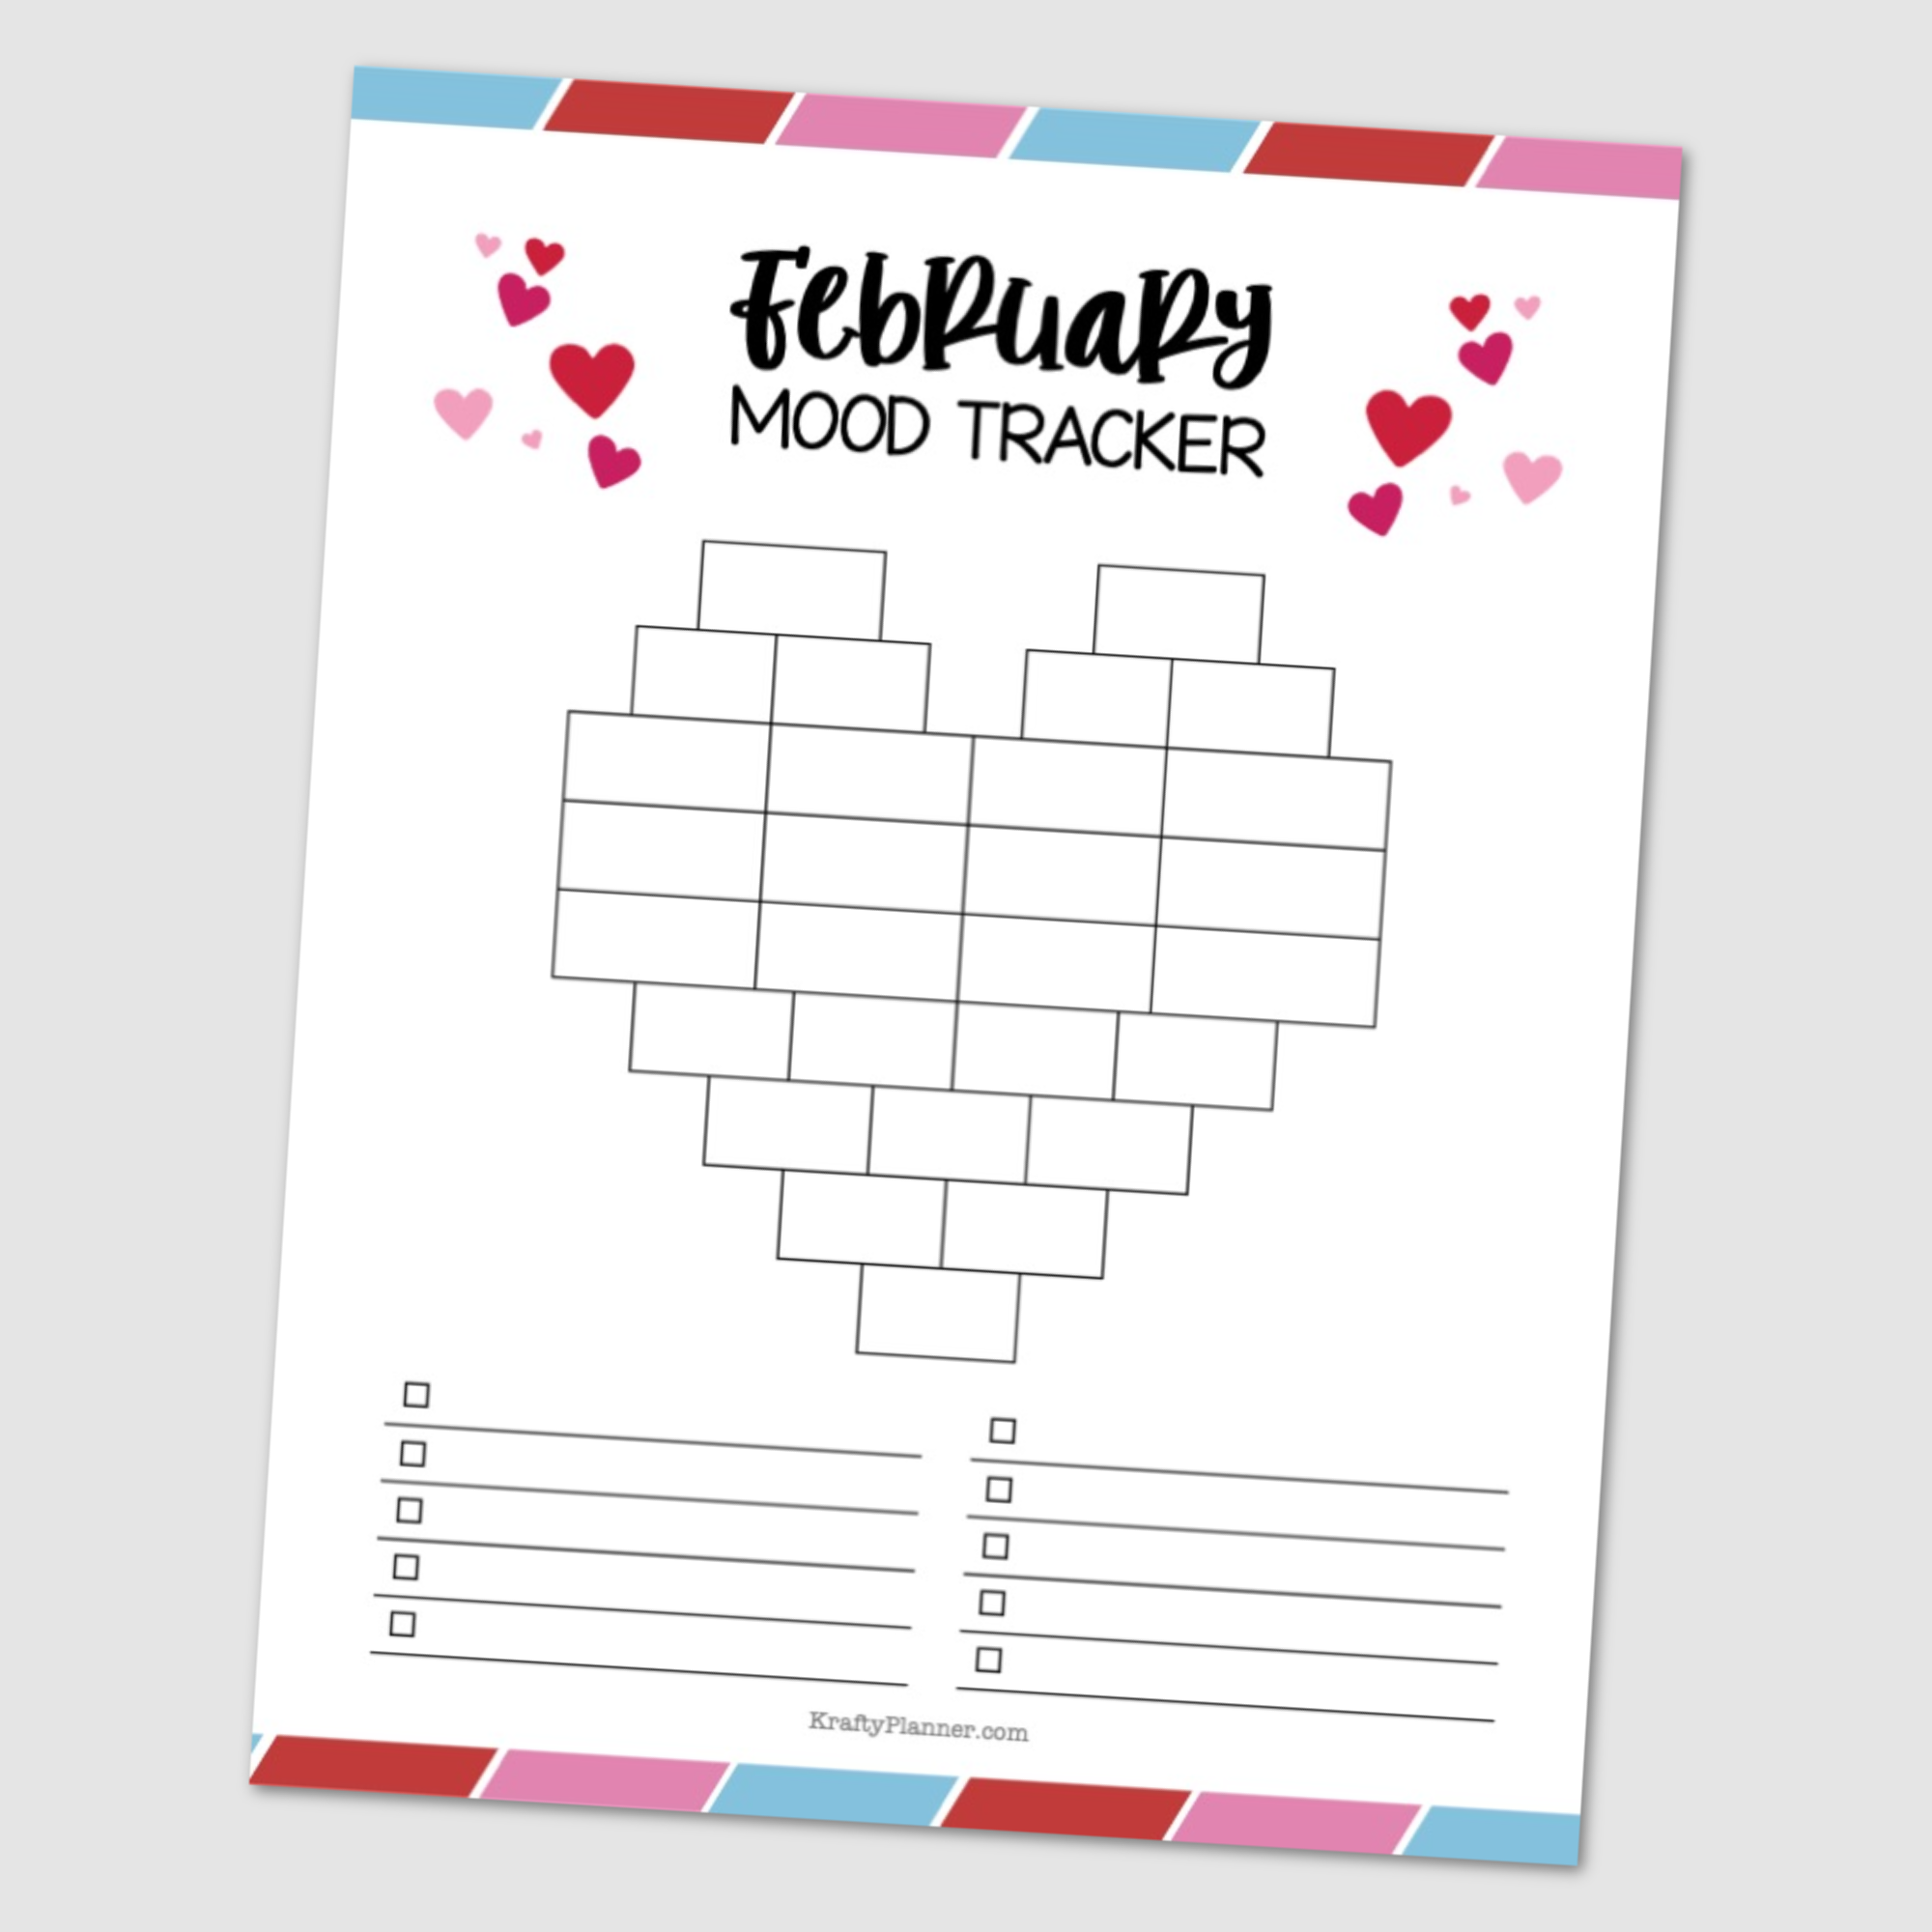 February Mood Tracker {Free Printable} .png